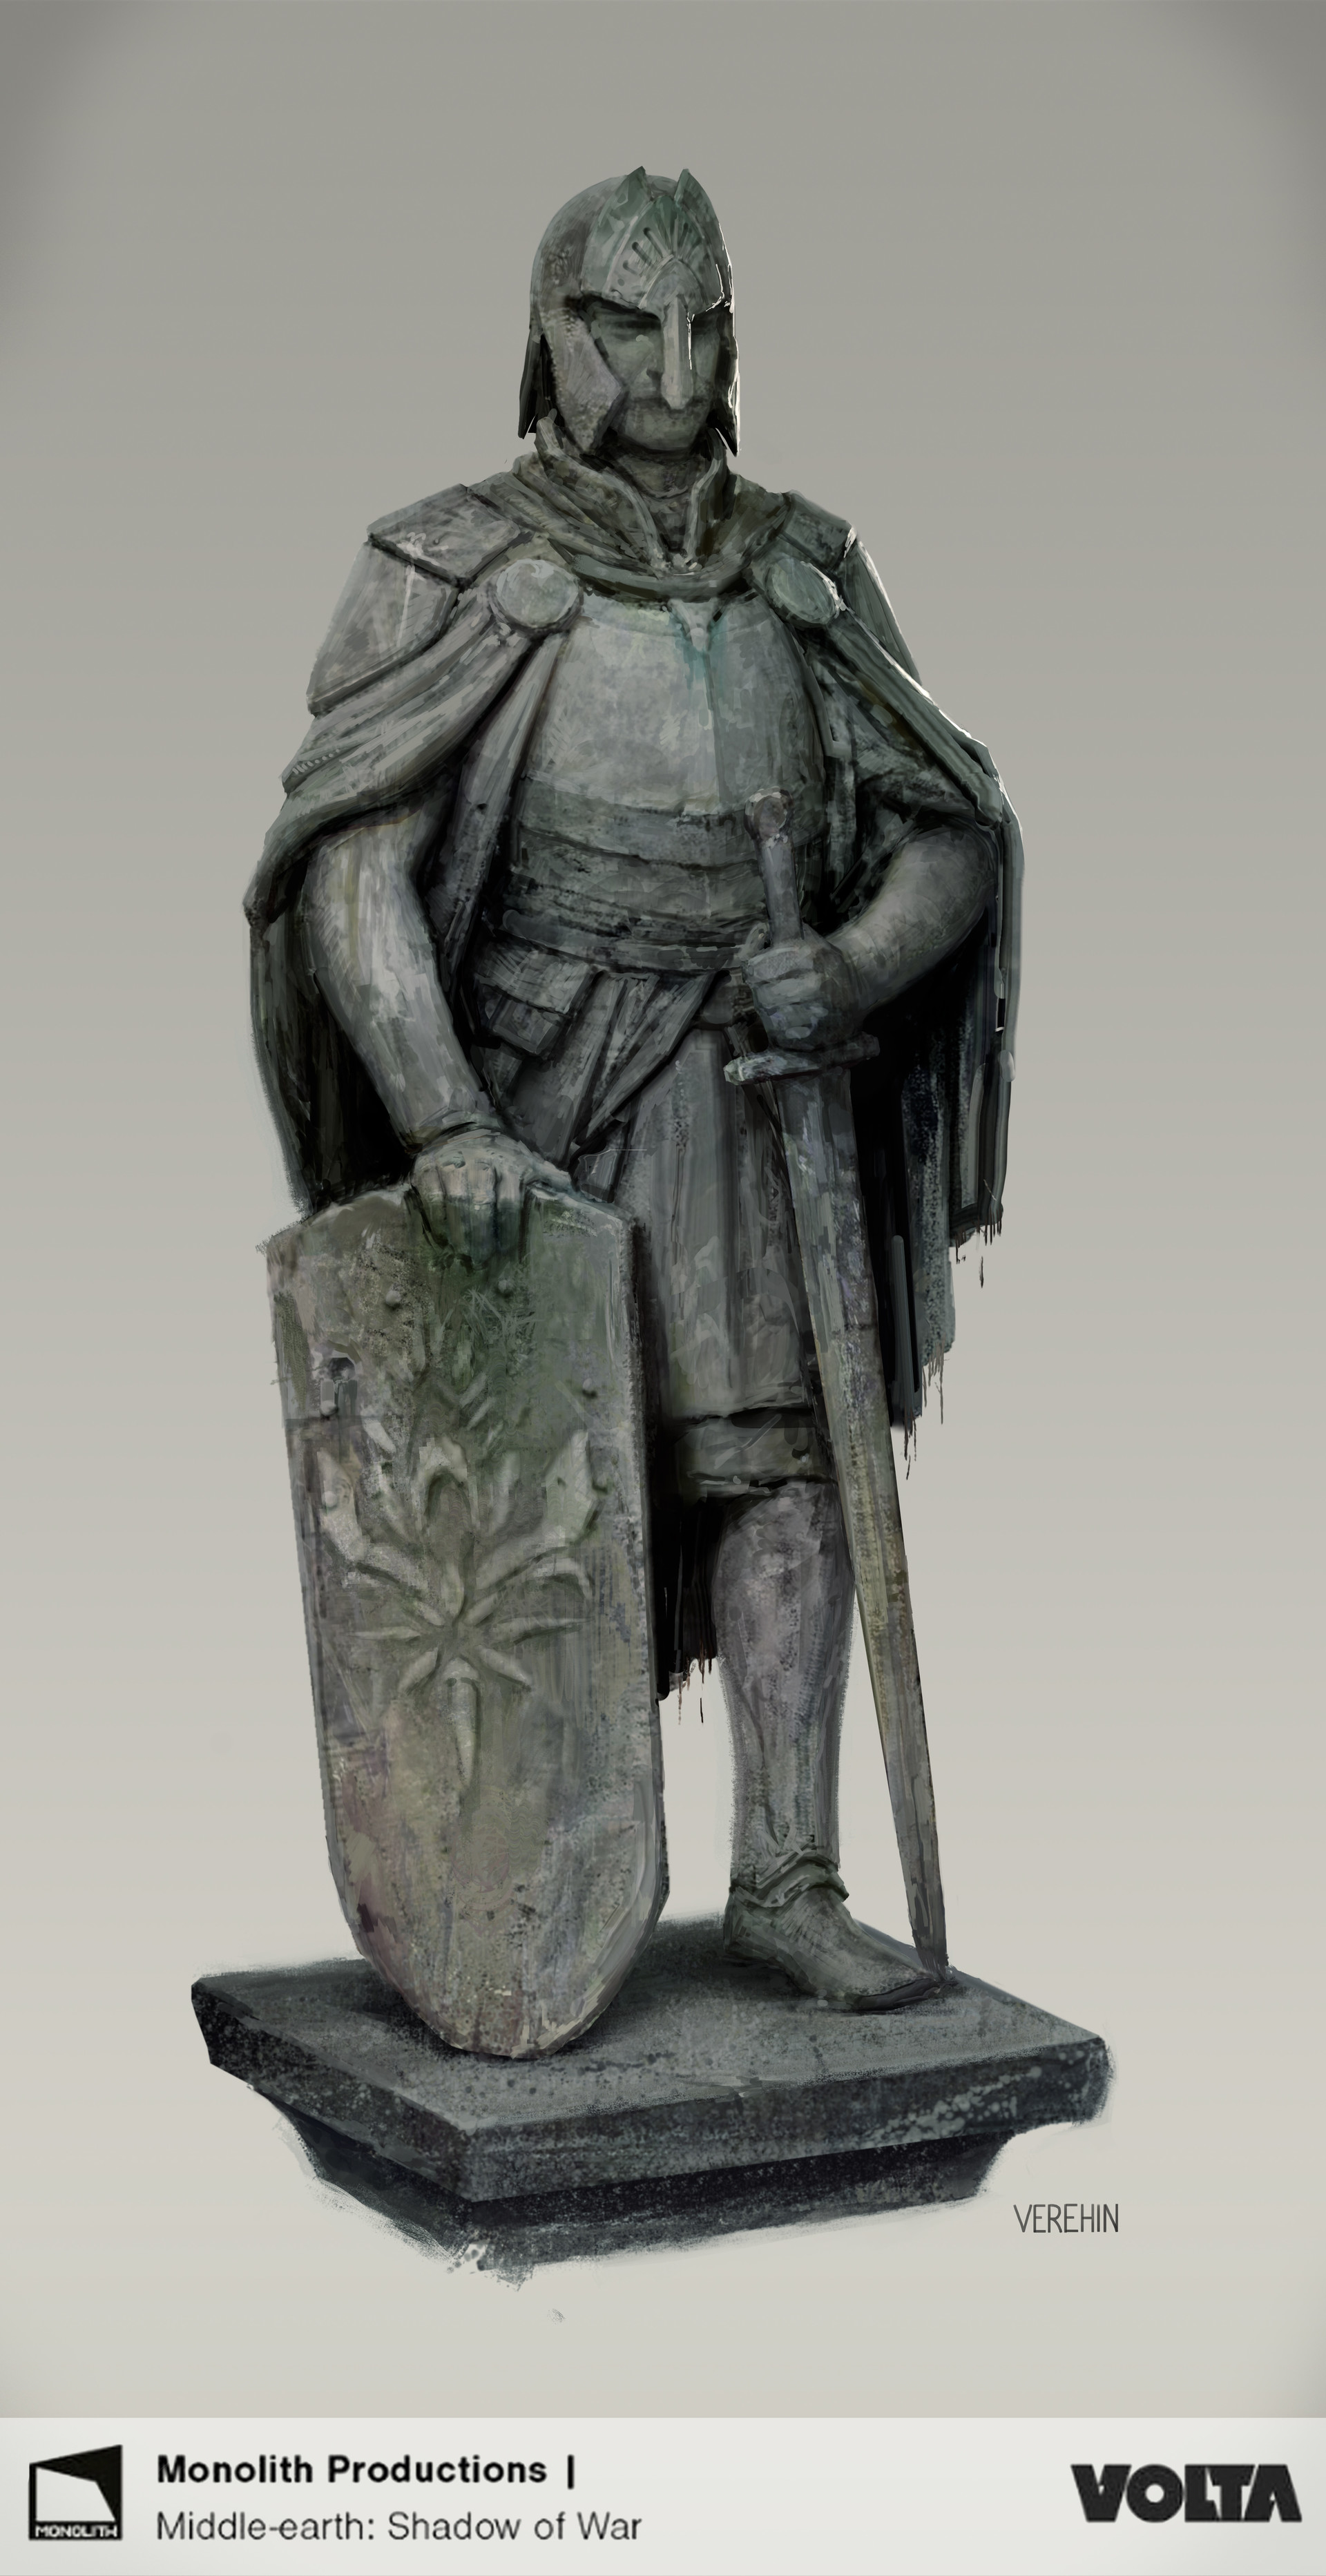 Maxim verehin knight statue